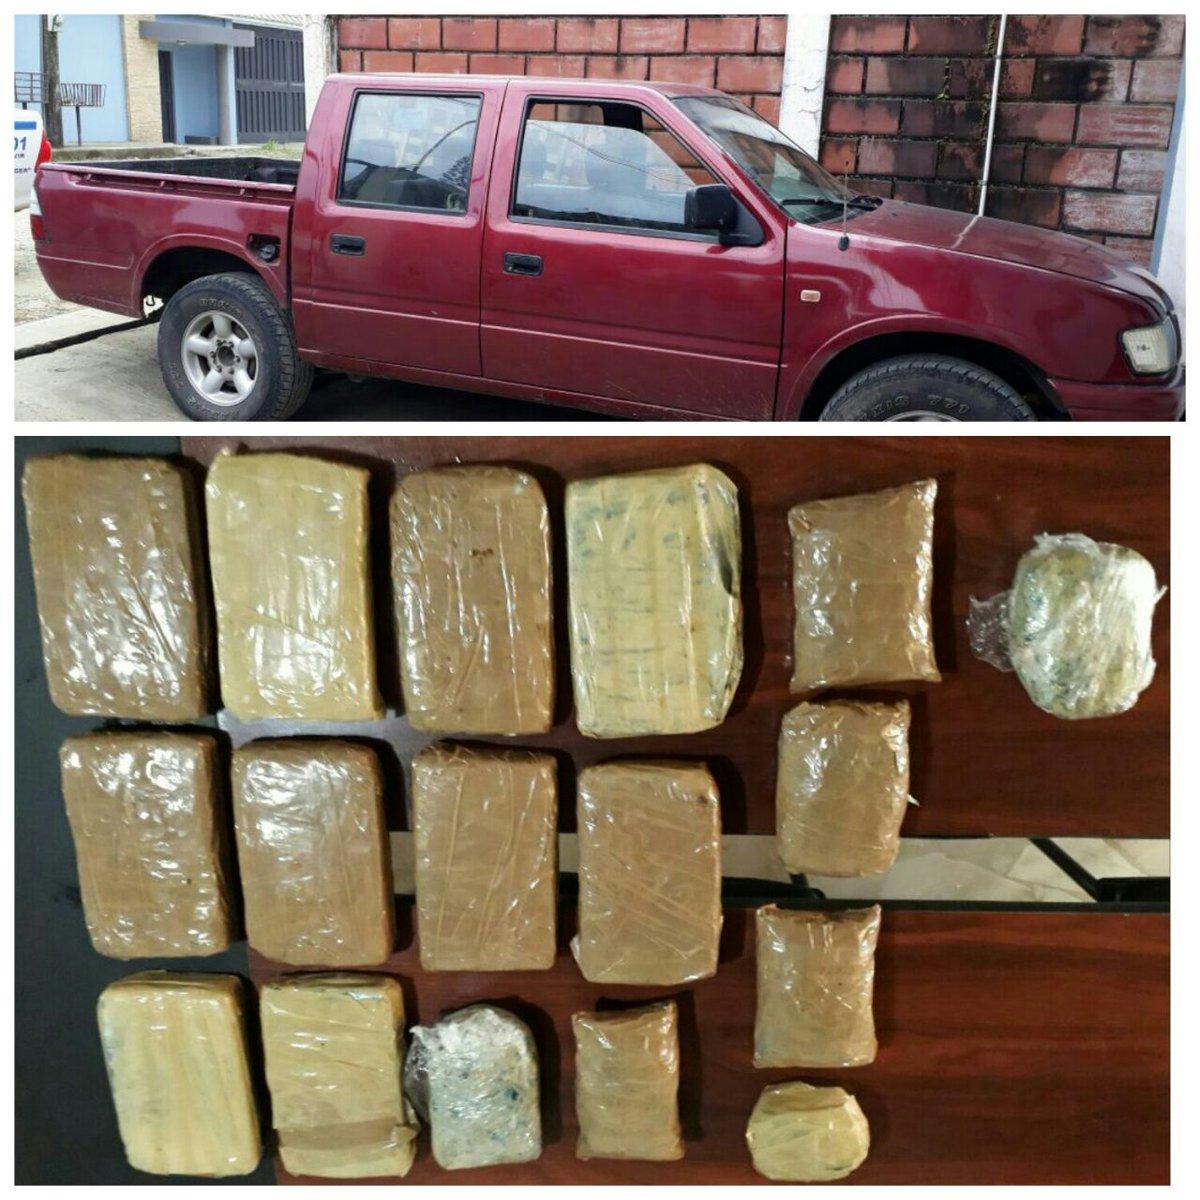 "lavozpopuli on Twitter: ""#Quevedo encuentran droga en camioneta ..."